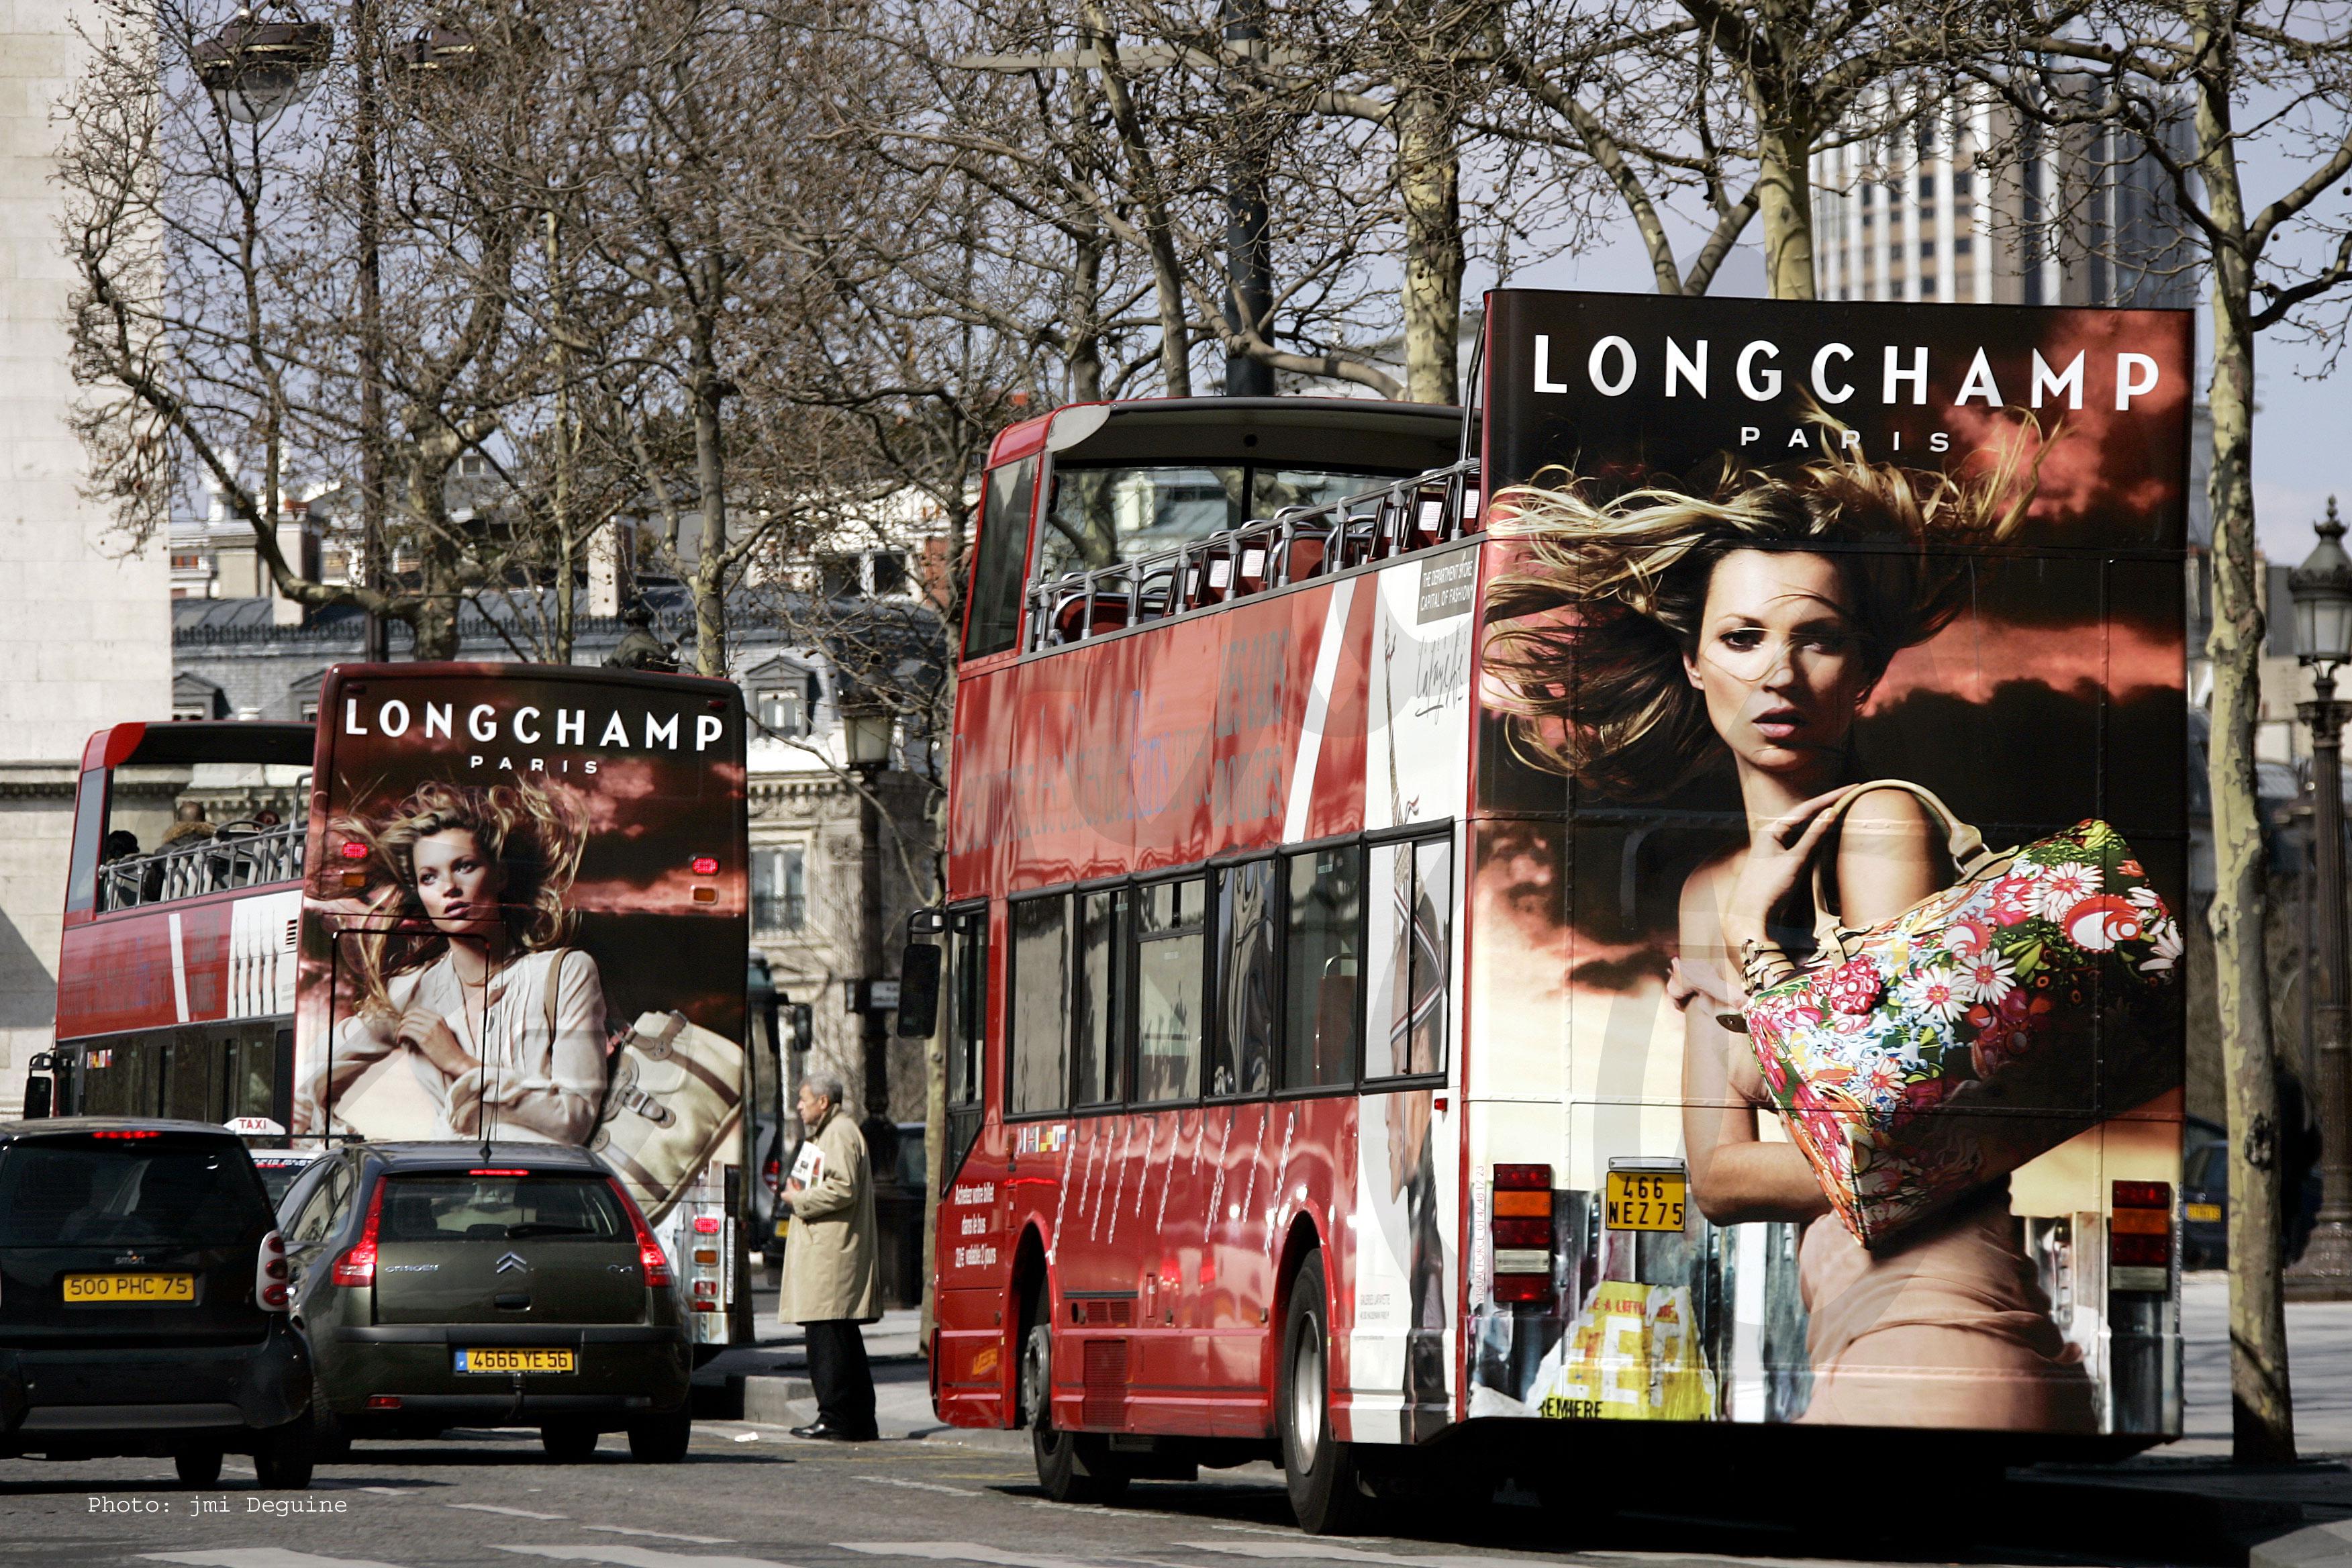 Campagne Longchamp